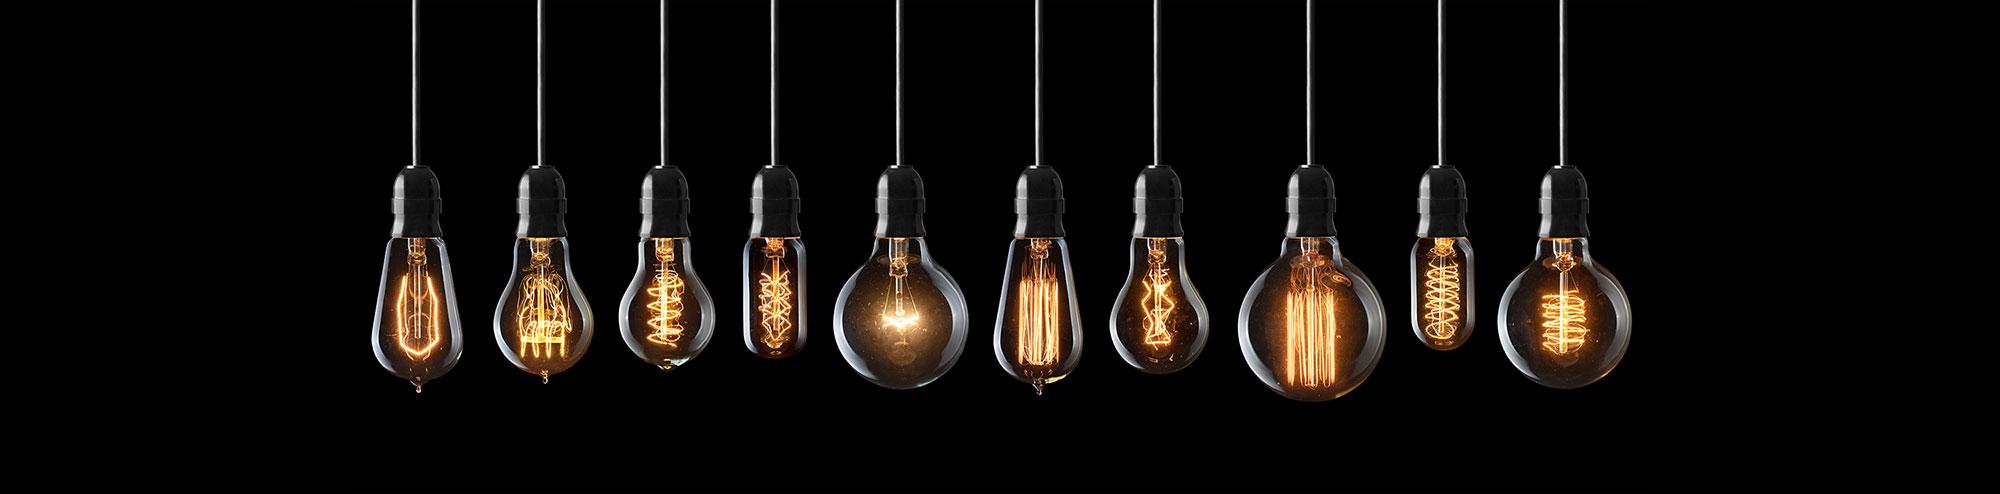 Iluminaciones Santiaguesas